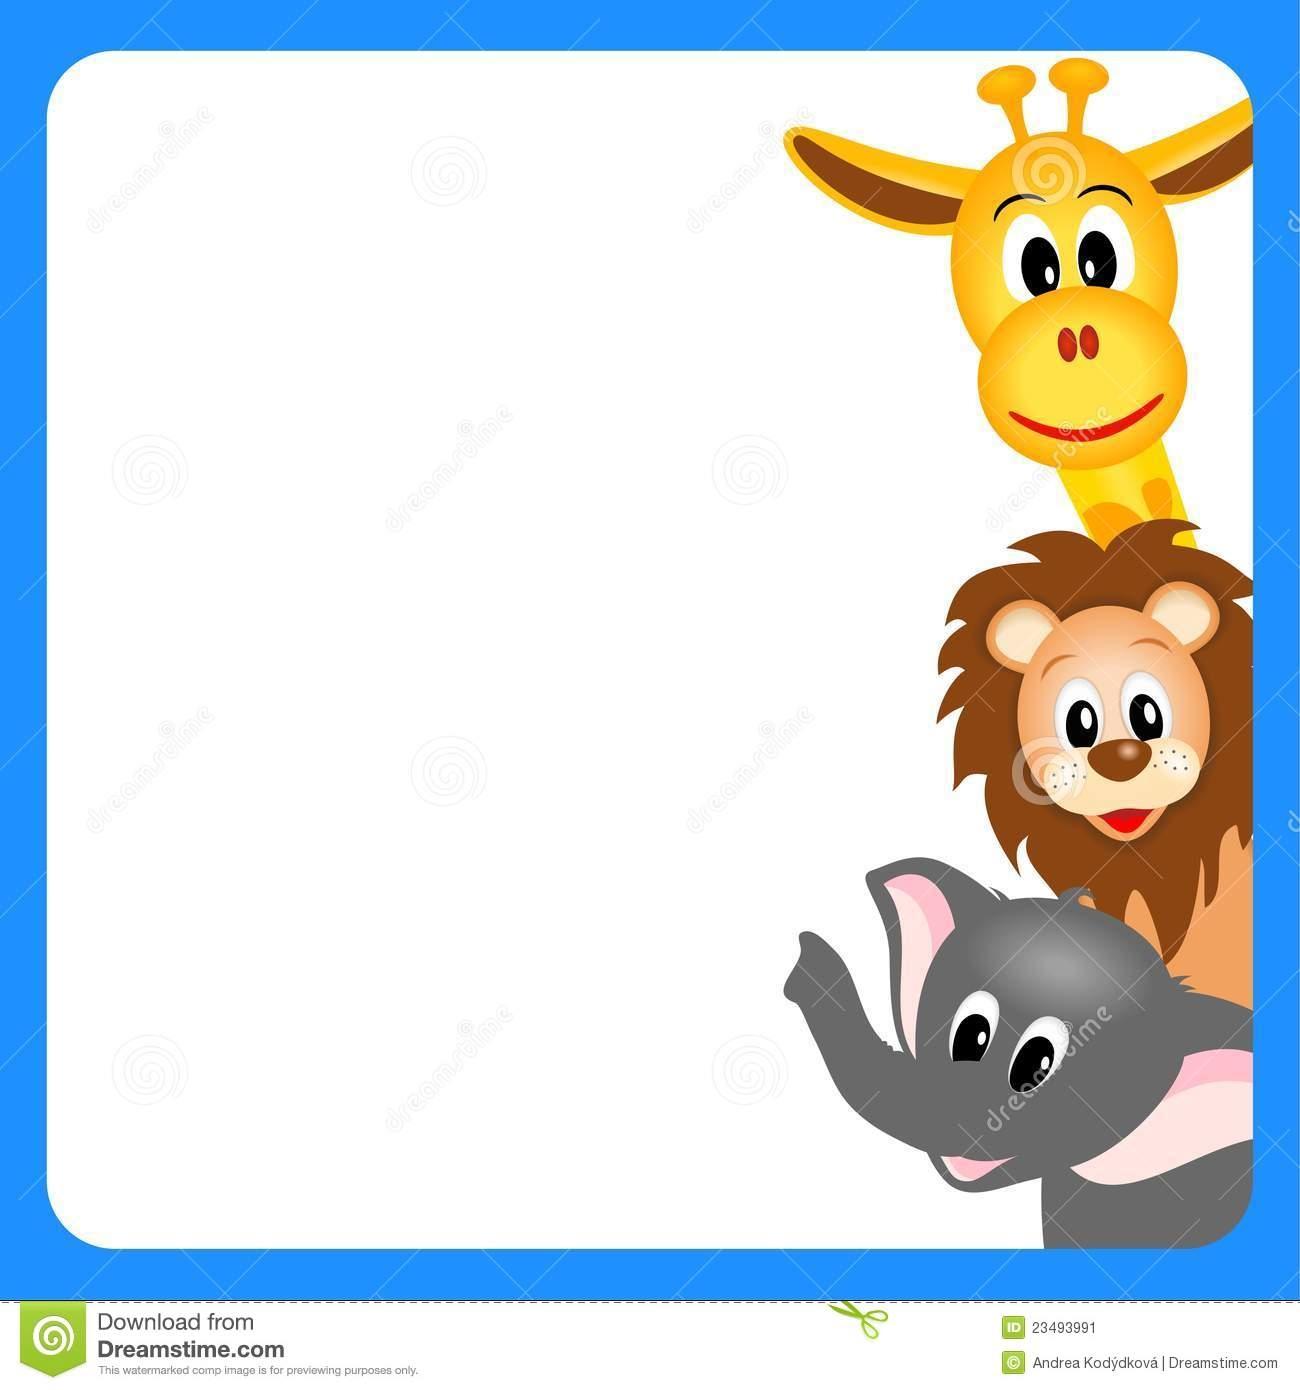 Free Animal Cliparts Border, Download Free Clip Art, Free.